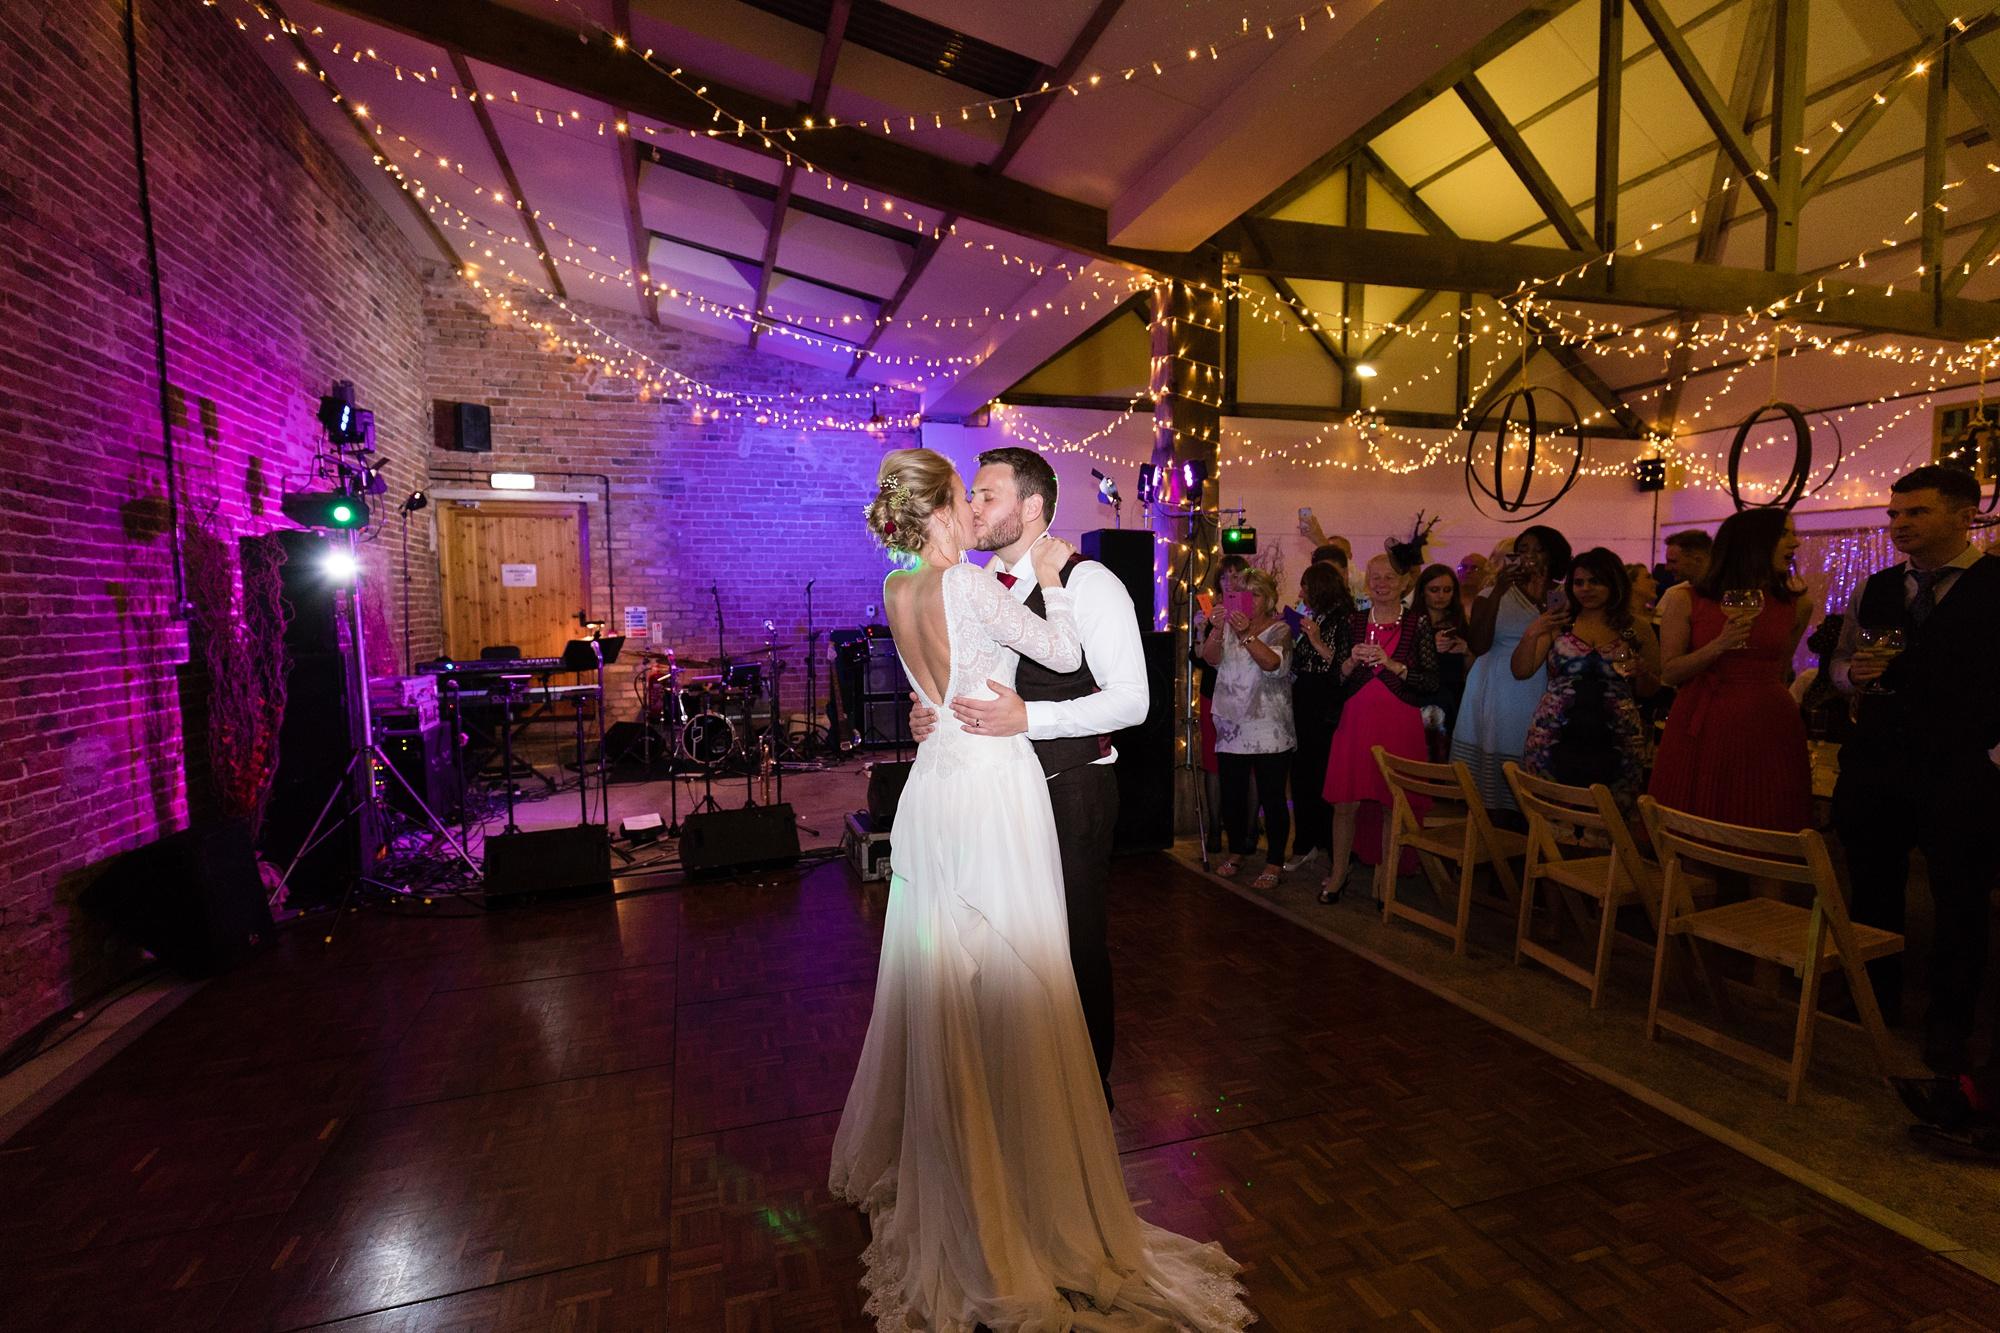 Yorkshire Wedding Photographers first dance under purple lights